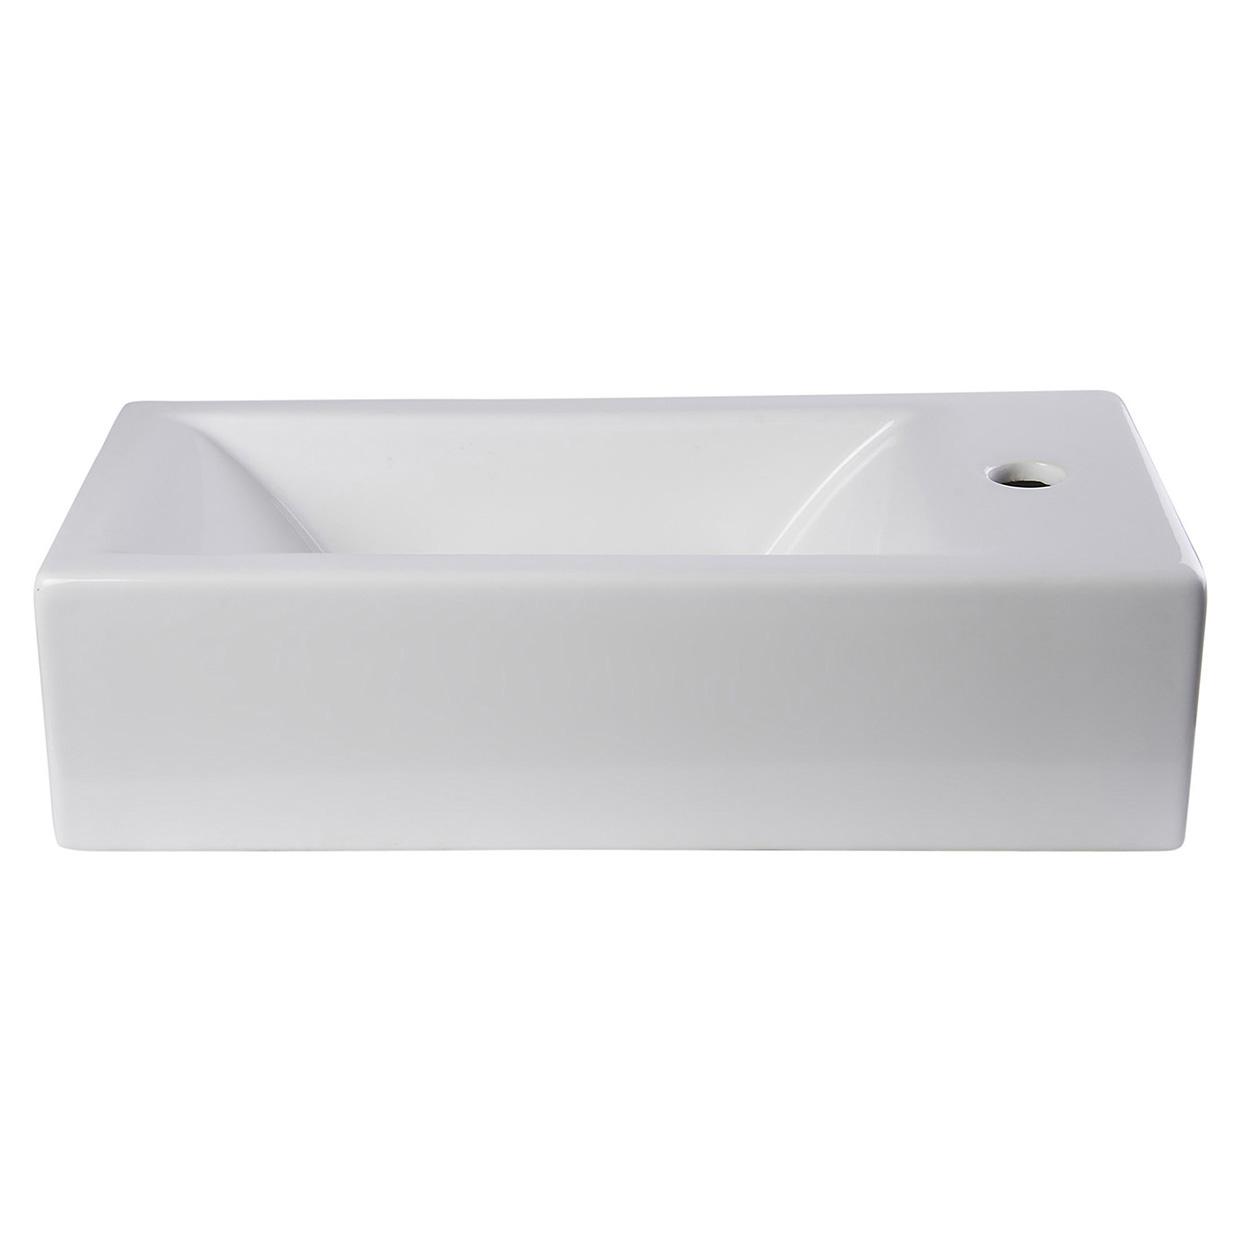 Bath4all Alfi Brand Ab108 Small White Modern Rectangular Wall Mounted Ceramic Bathroom Sink Basin